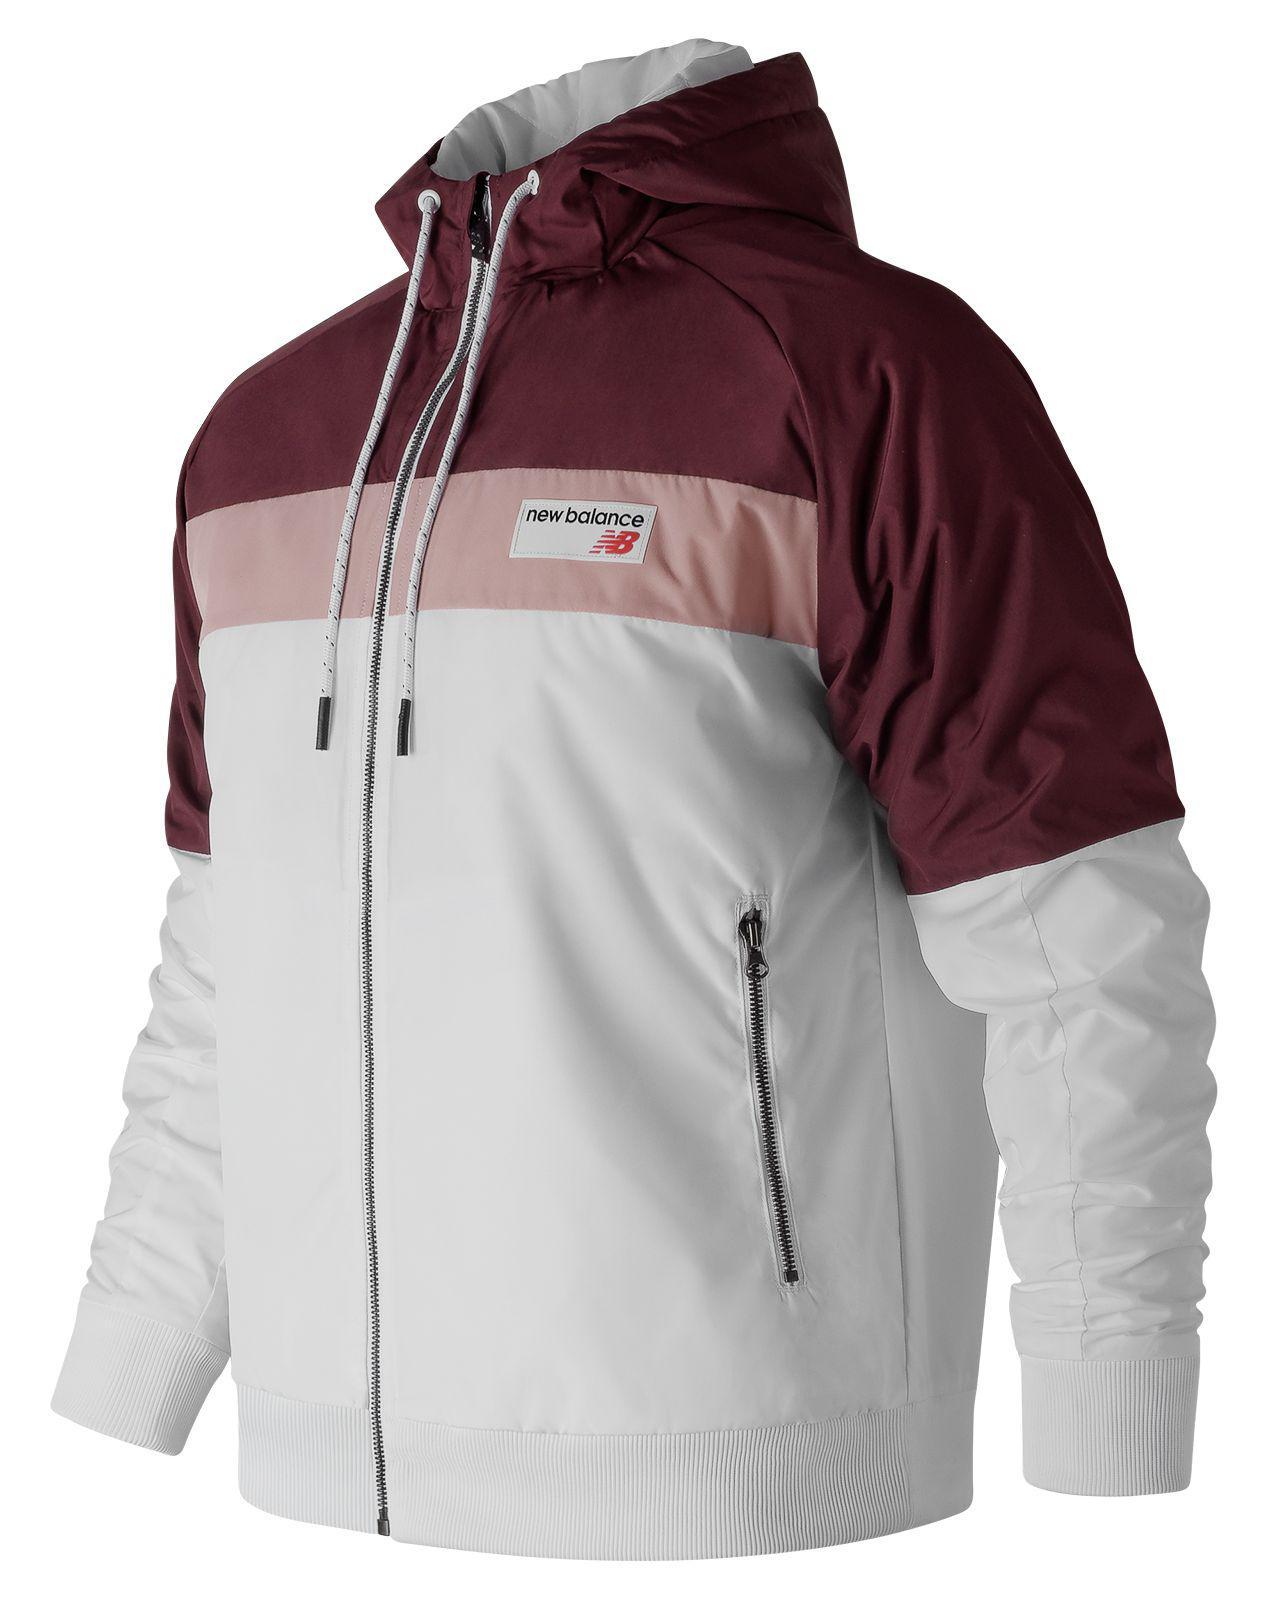 Nb Athletics 78 Winter Jacket